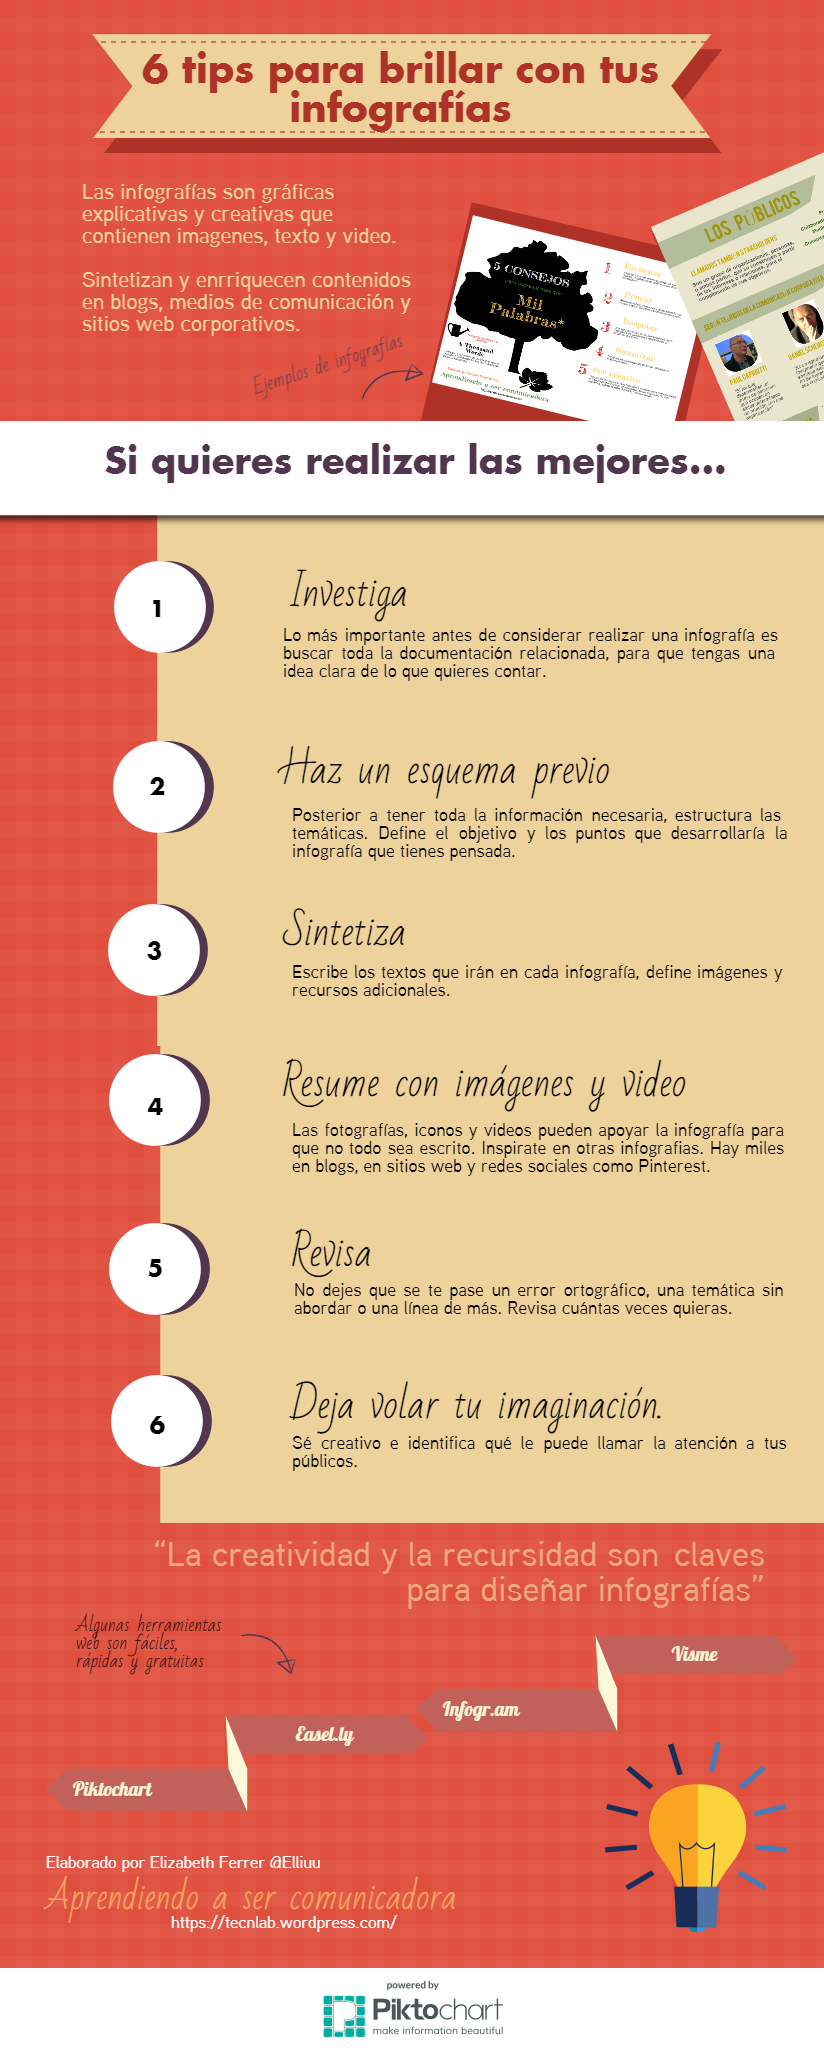 6 claves para brillar con tus infografías